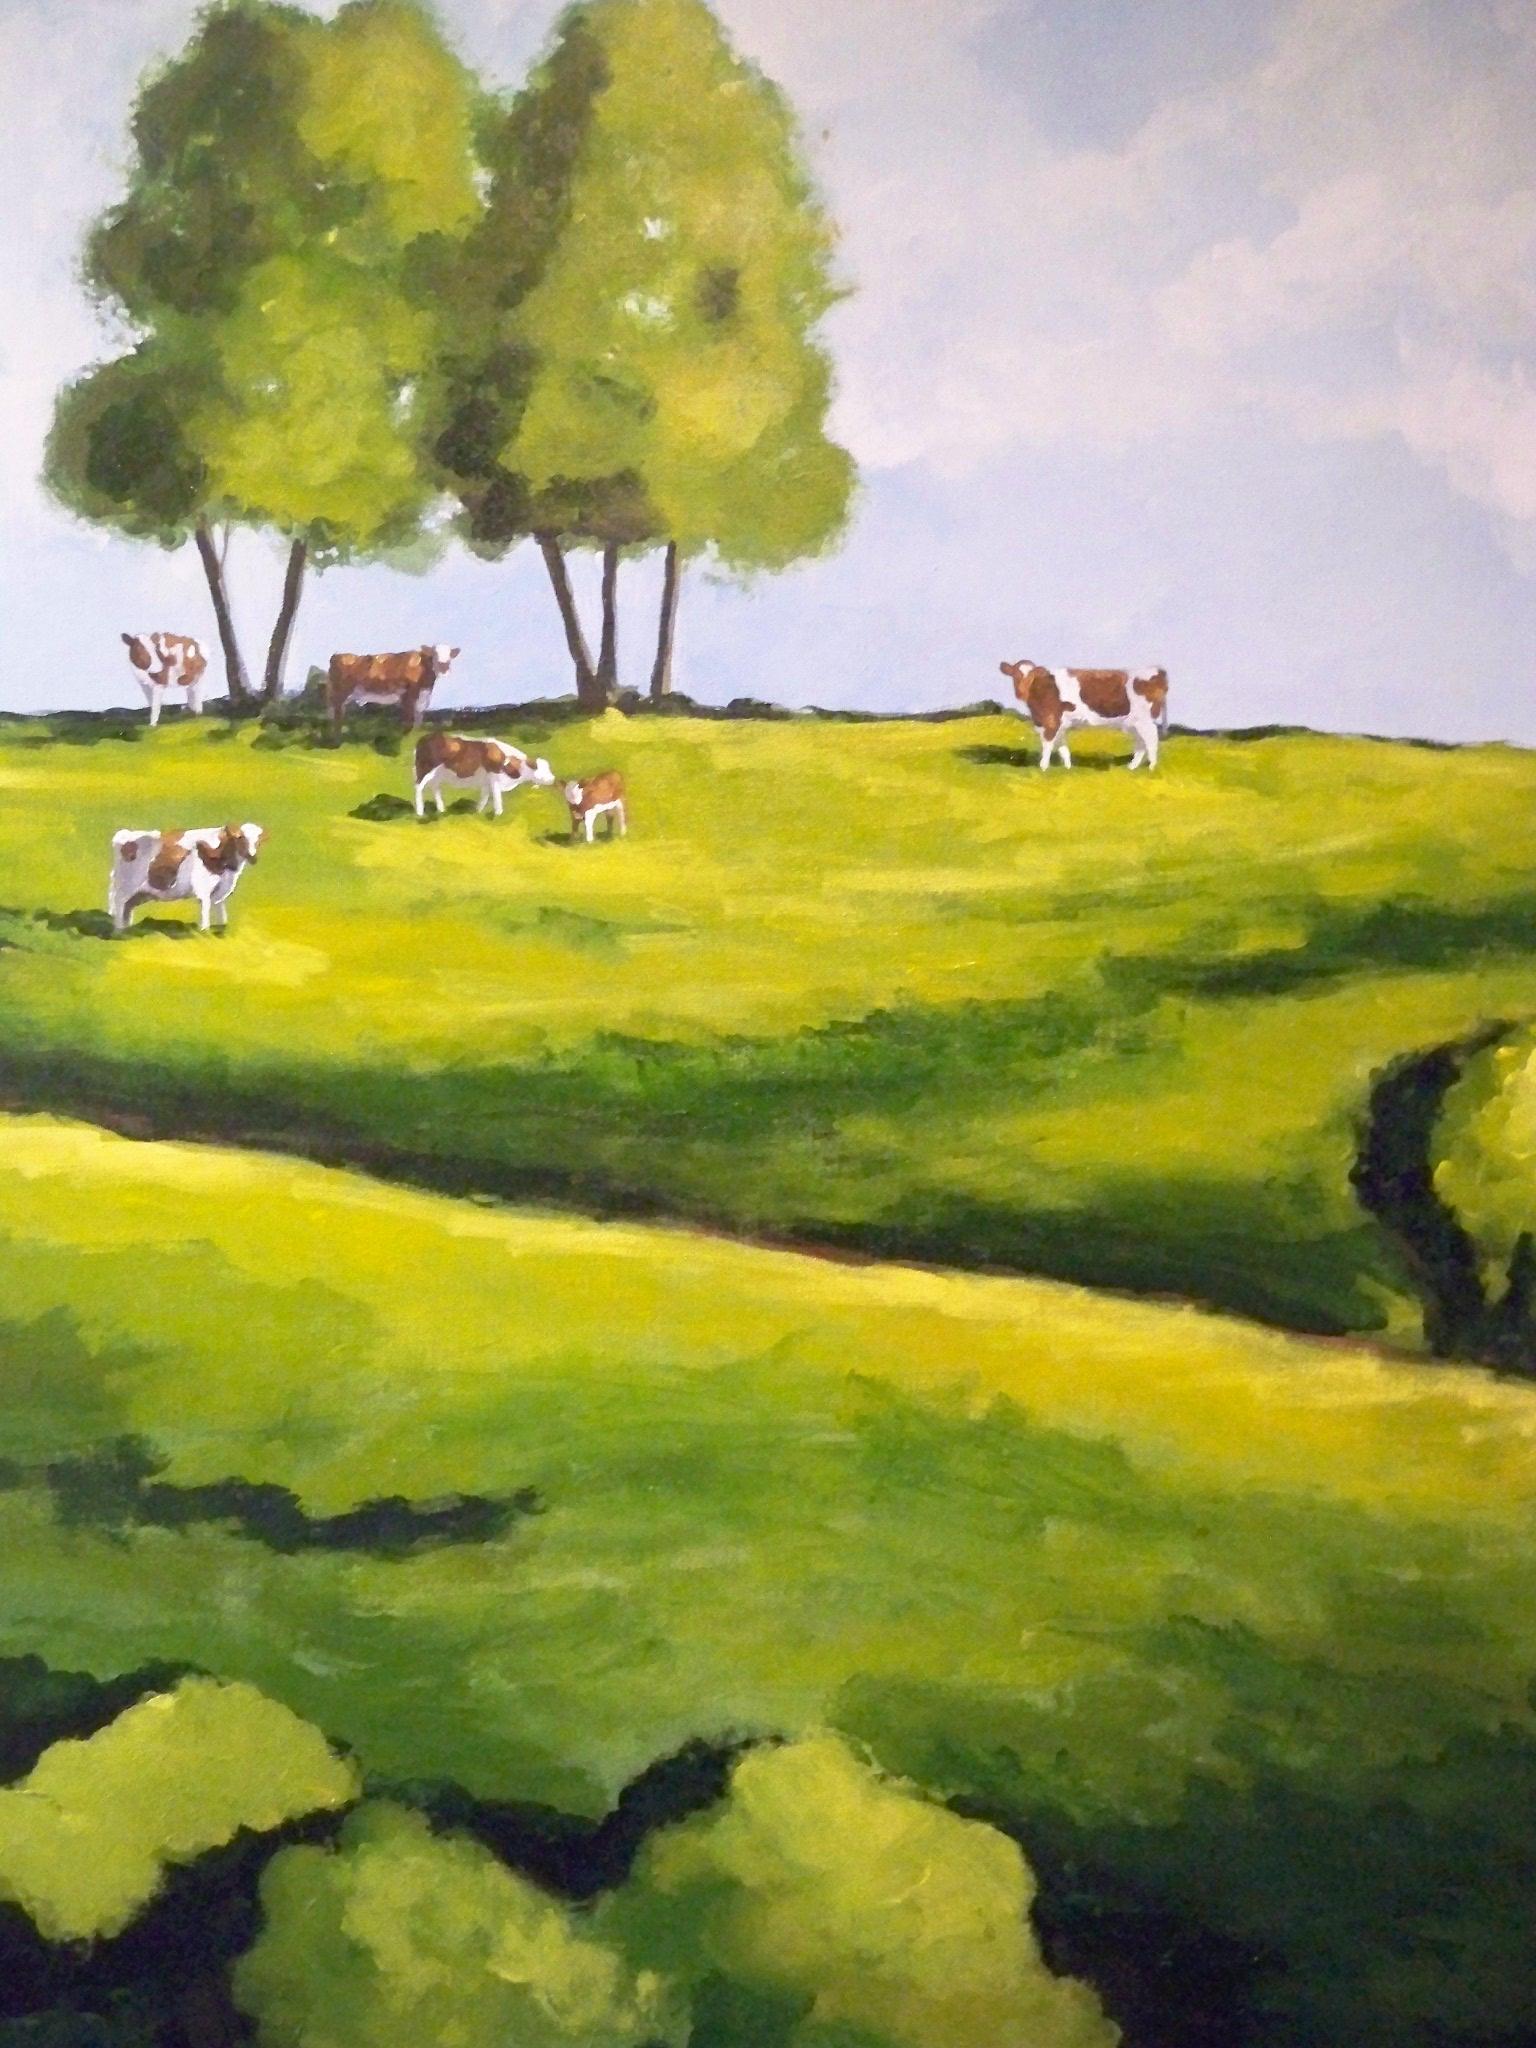 Murals By Marg--Original Art Cows 2011.jpg